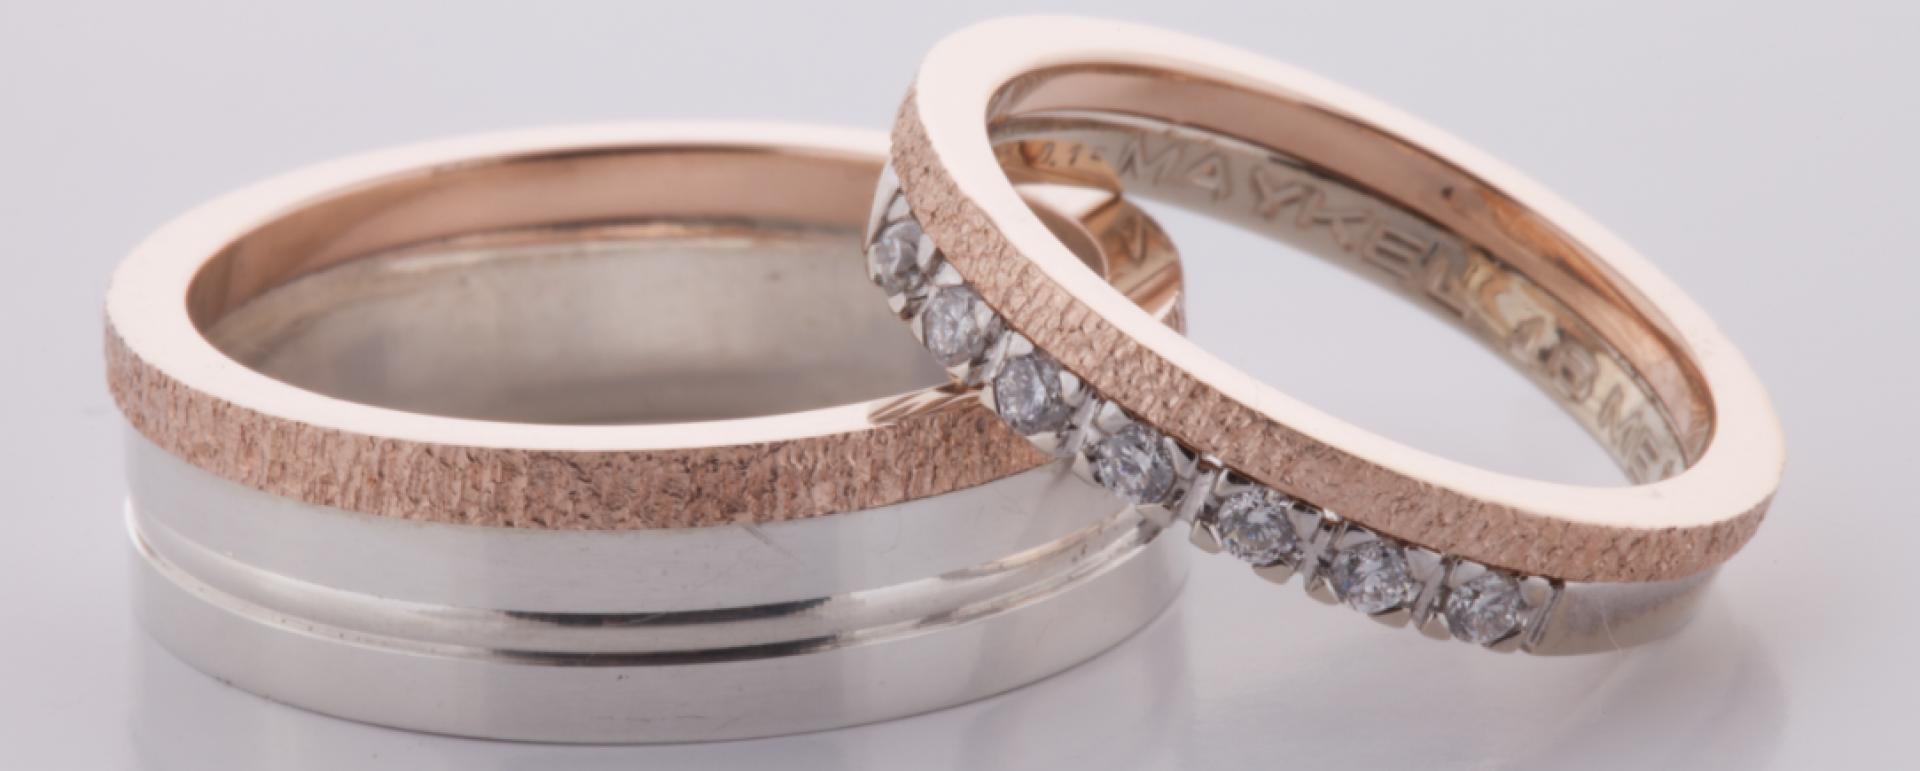 Juwelier Warda